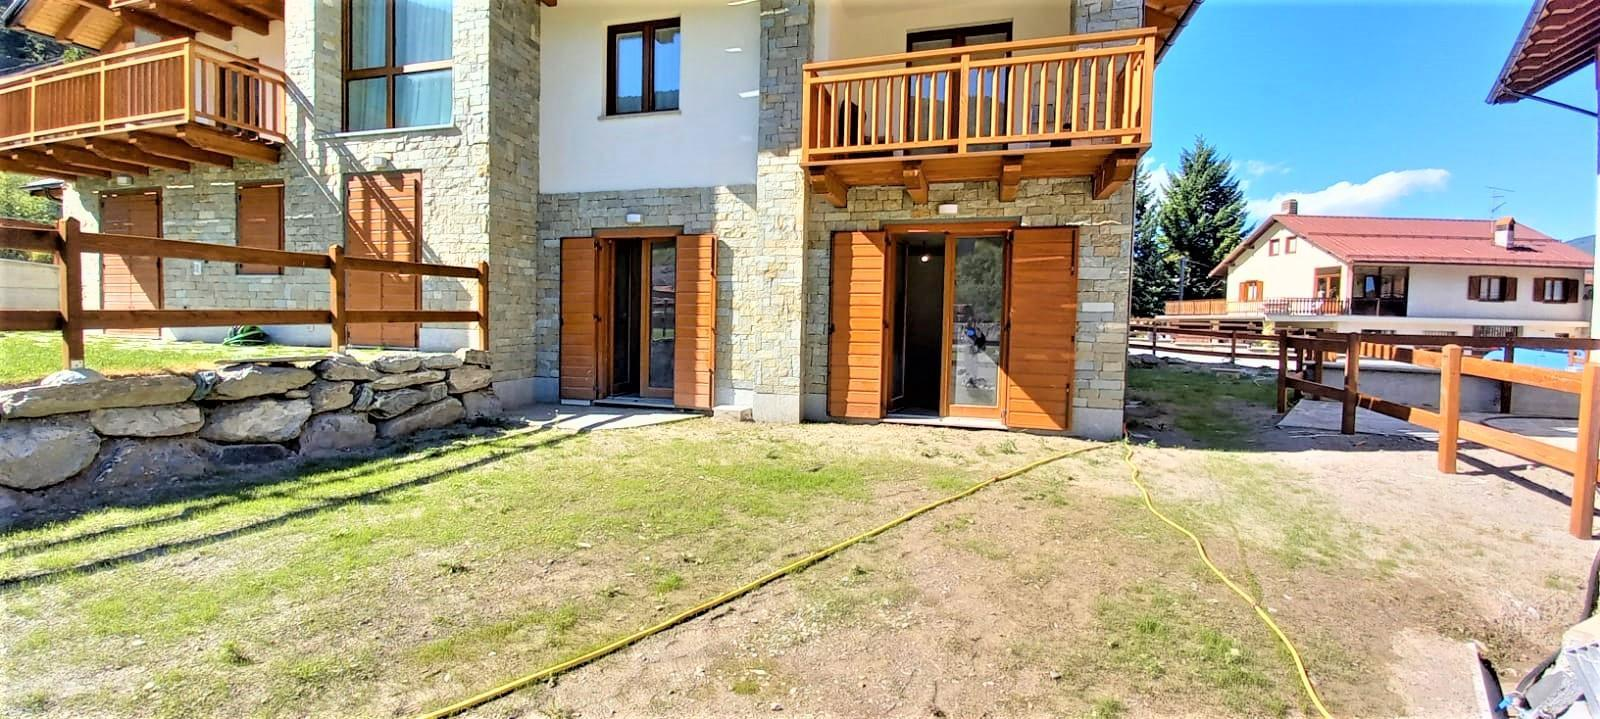 Vendita Bilocale Appartamento Cesana Torinese via g.b. armand  220333